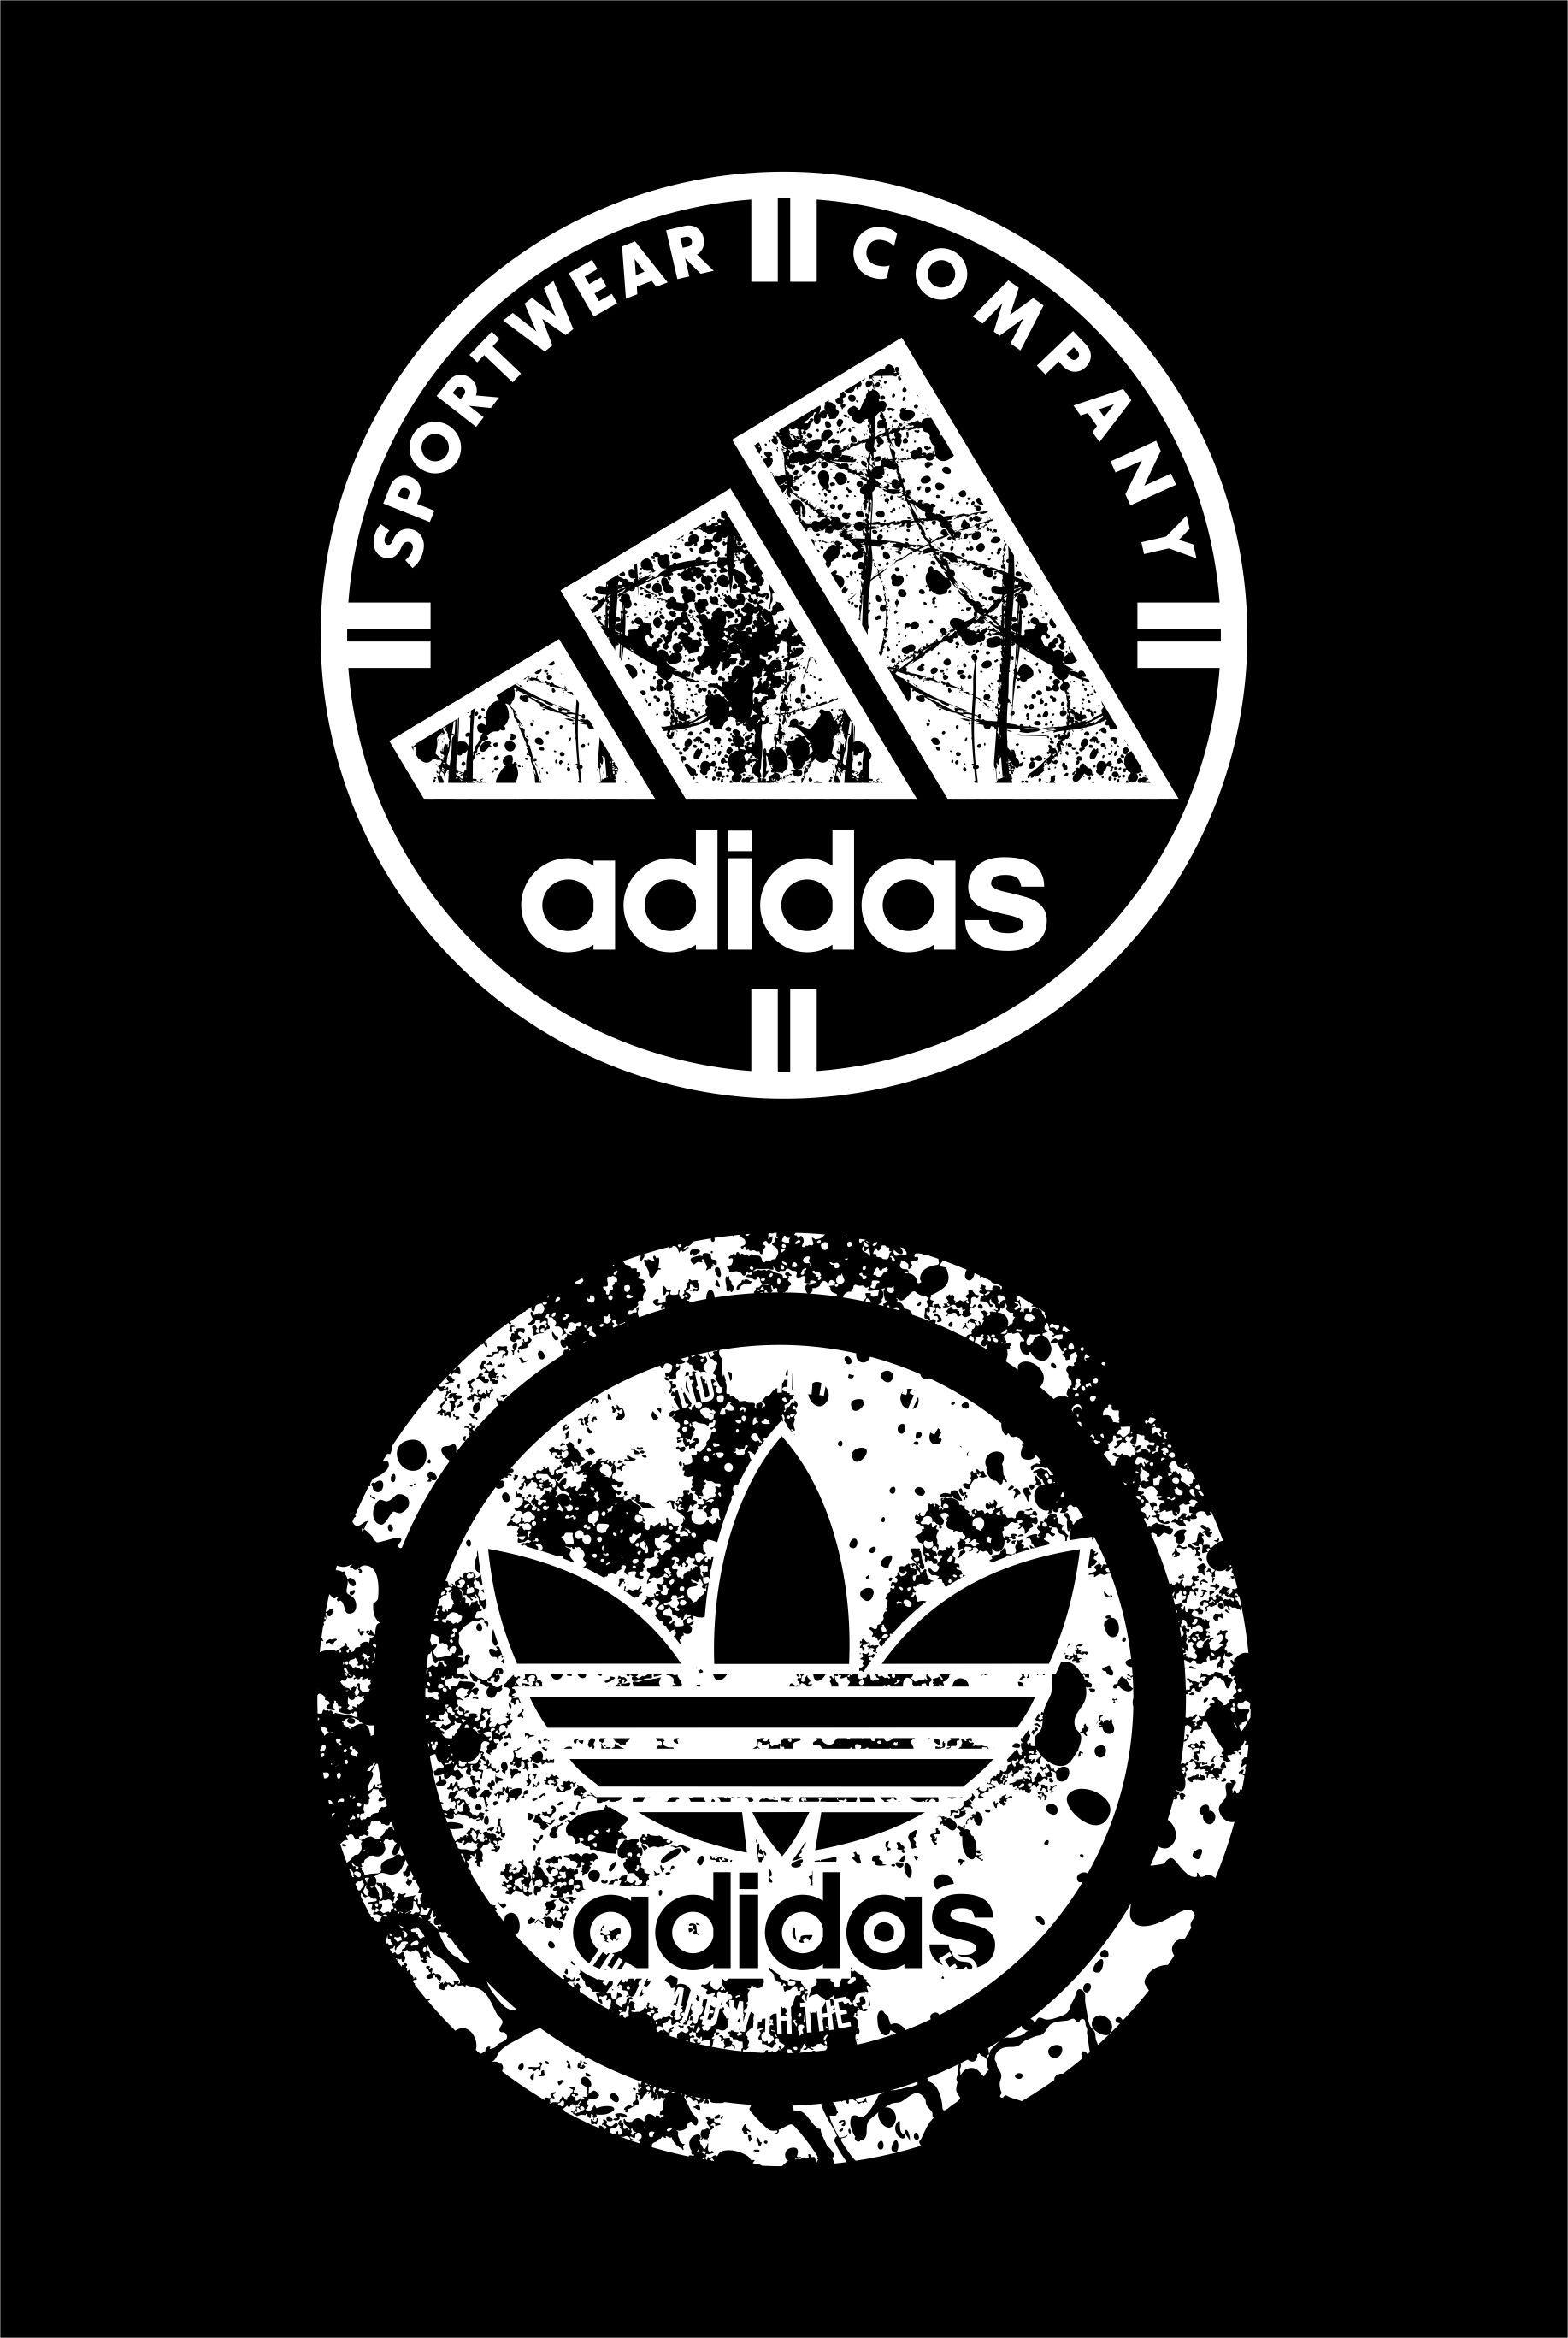 Integración Abrumador Implementar  vintage Vector #vintage #vector #vectorsurf #vintagevector #volcom #adidas  #billabong #rusty #nike #puma #lev… | Adidas logo wallpapers, Nike art,  Adidas wallpapers